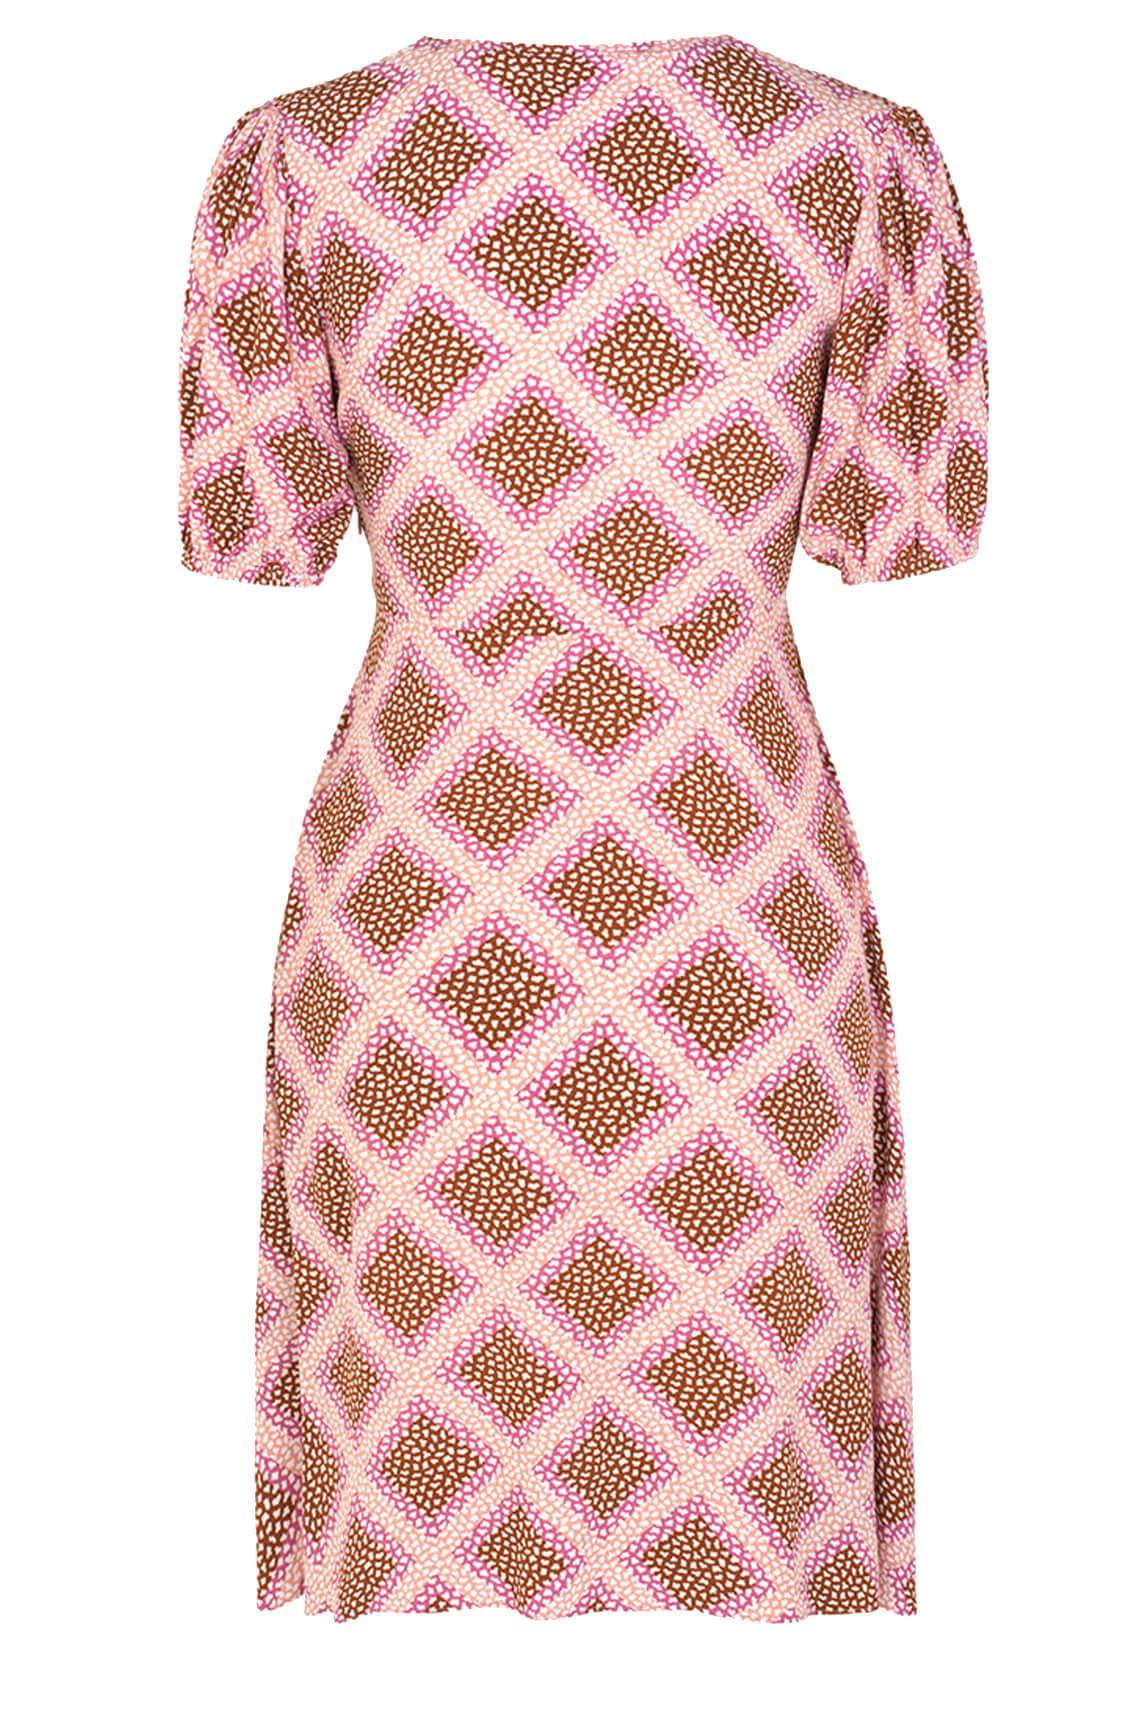 Samsoe Samsoe Dames Petunia jurk roze